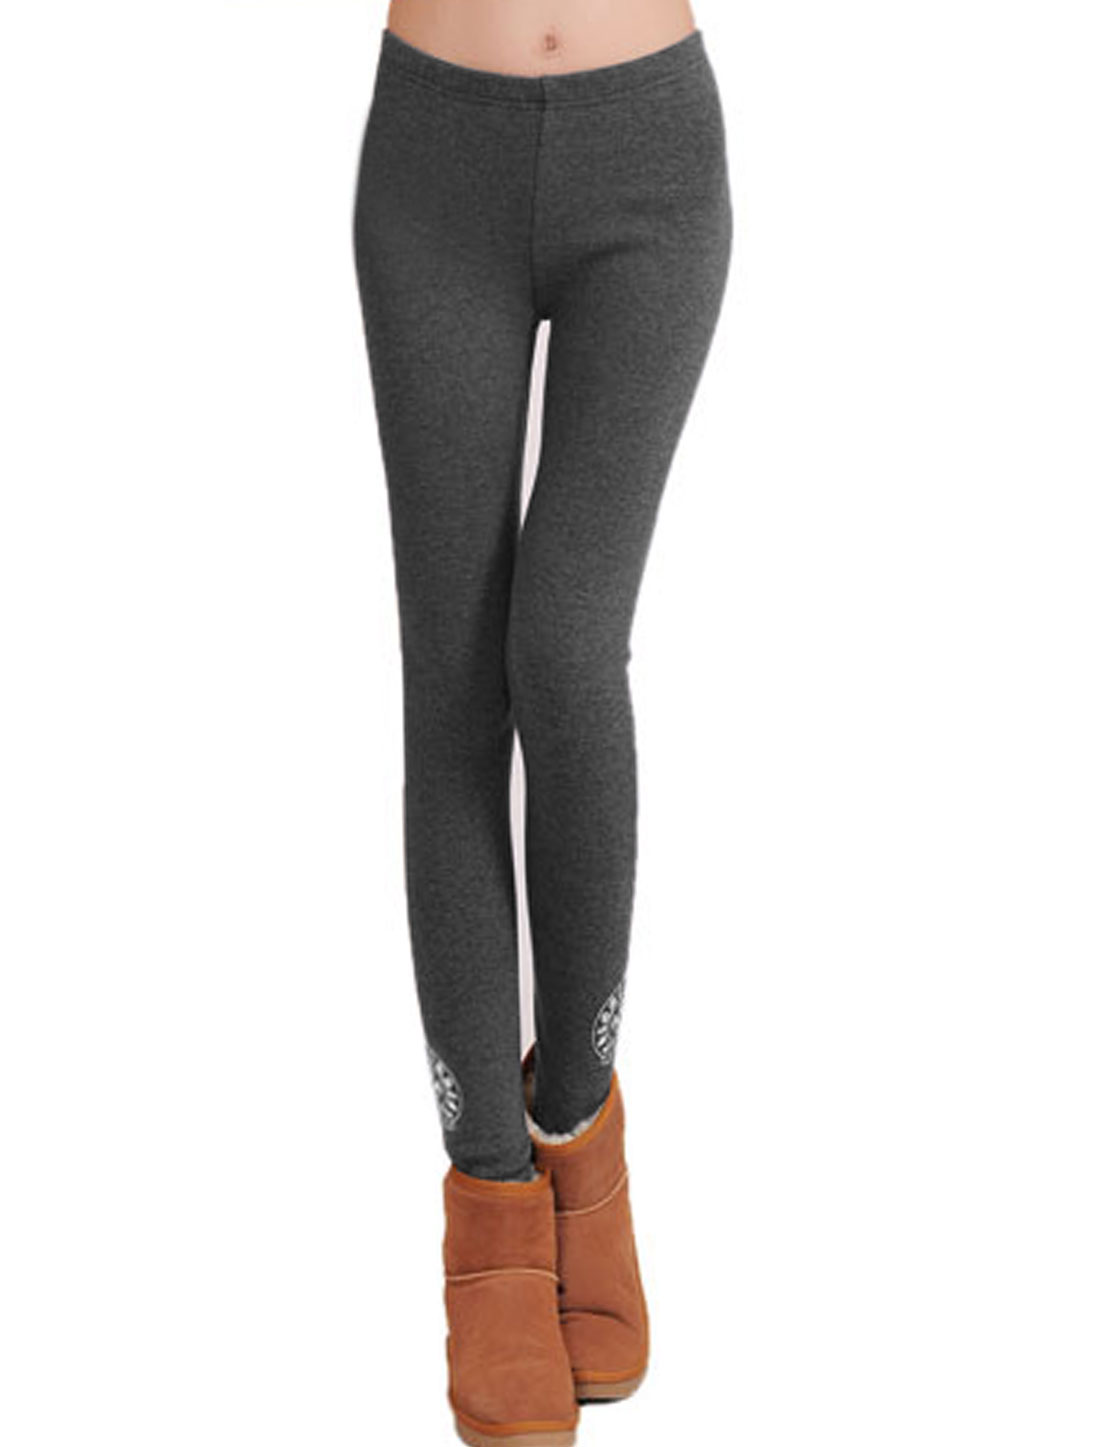 Ladies Dark Gray Elastic Waist Mid Rise Novelty Prints Skinny Leggings XS